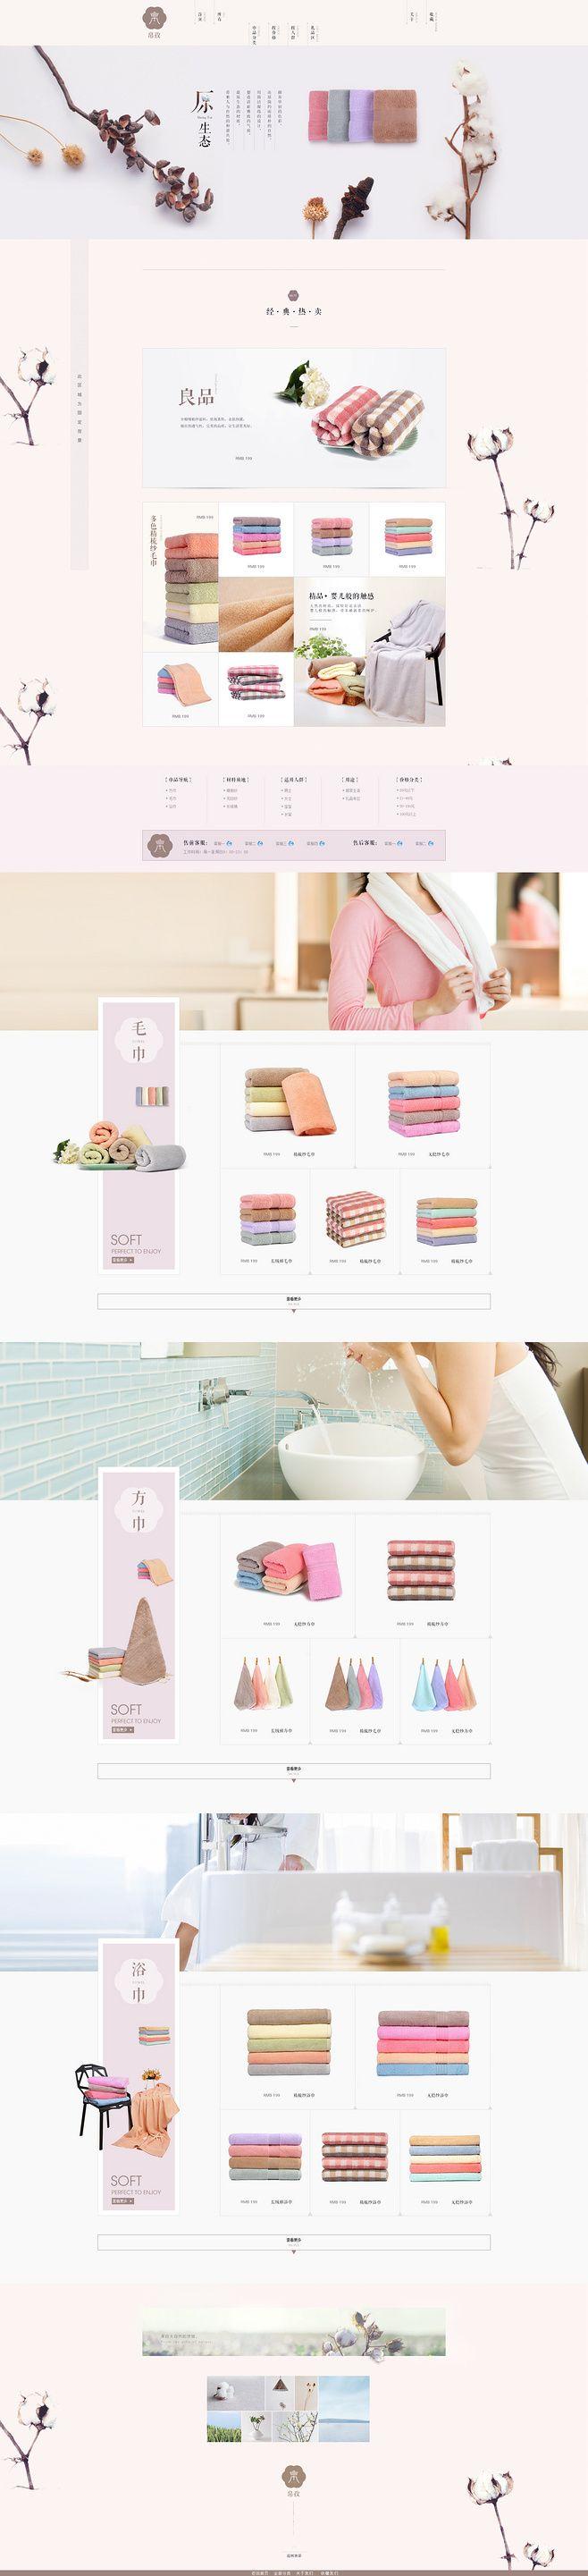 douweiwei采集到首页设计(996图)_花瓣UI/UX